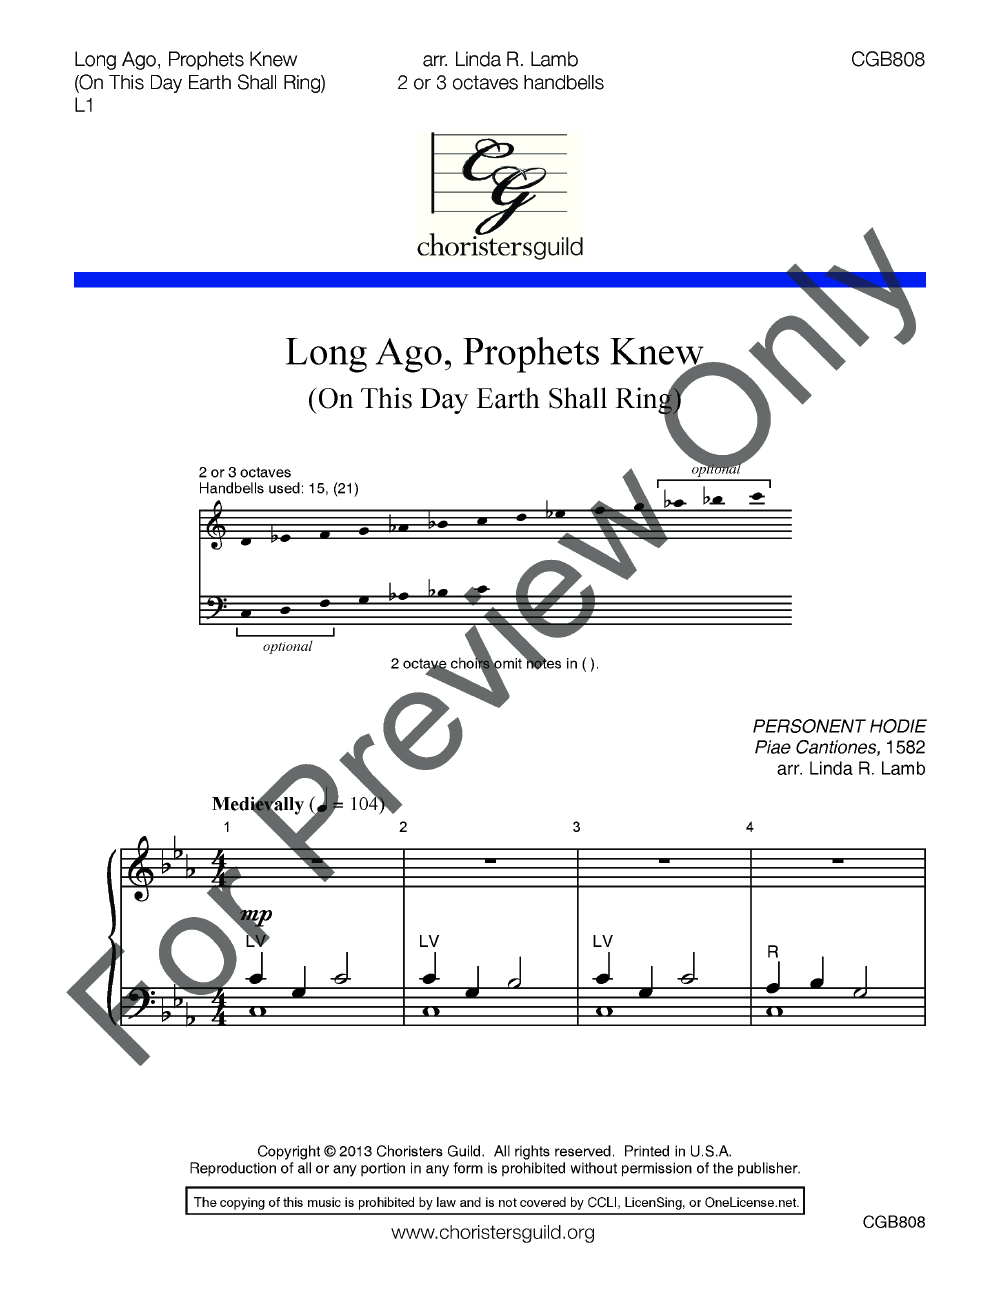 Long Ago Prophets Knew Arr Linda R Lamb Jw Pepper Sheet Music